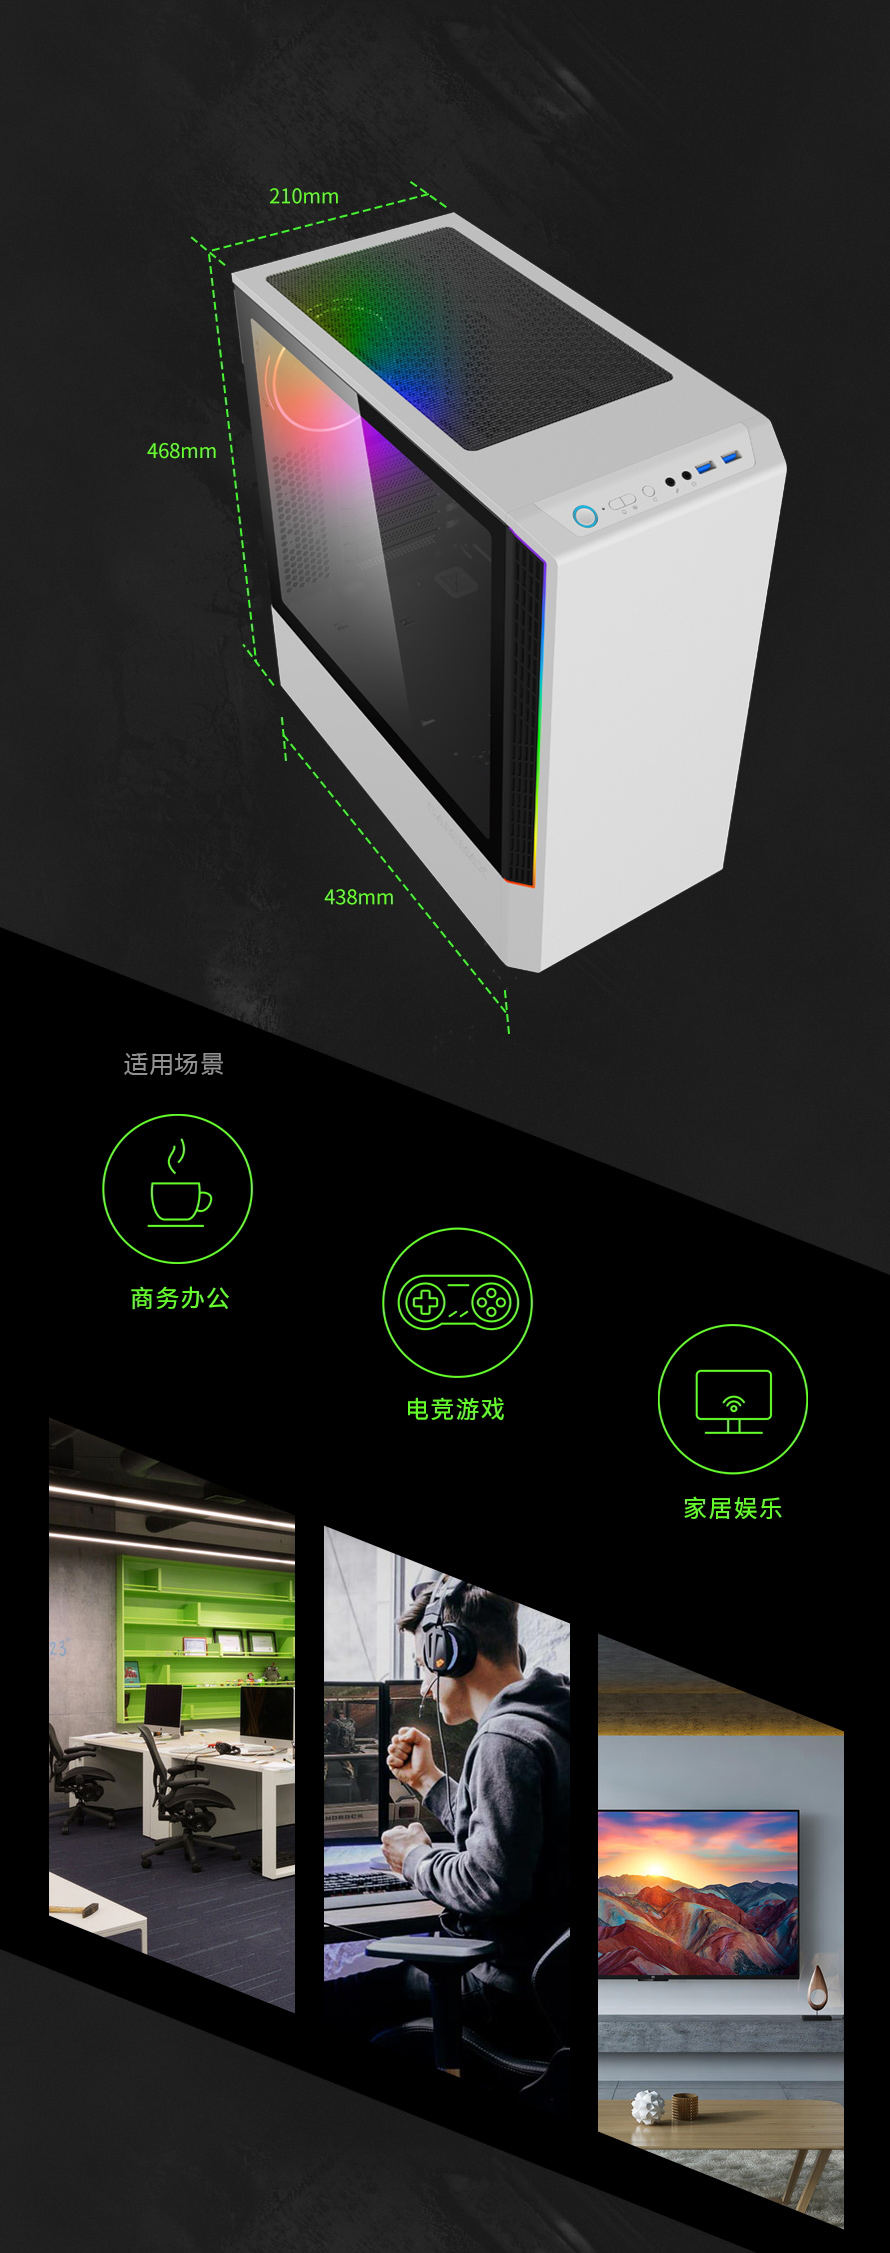 T802_Panda详情页中文_看图王_02.jpg